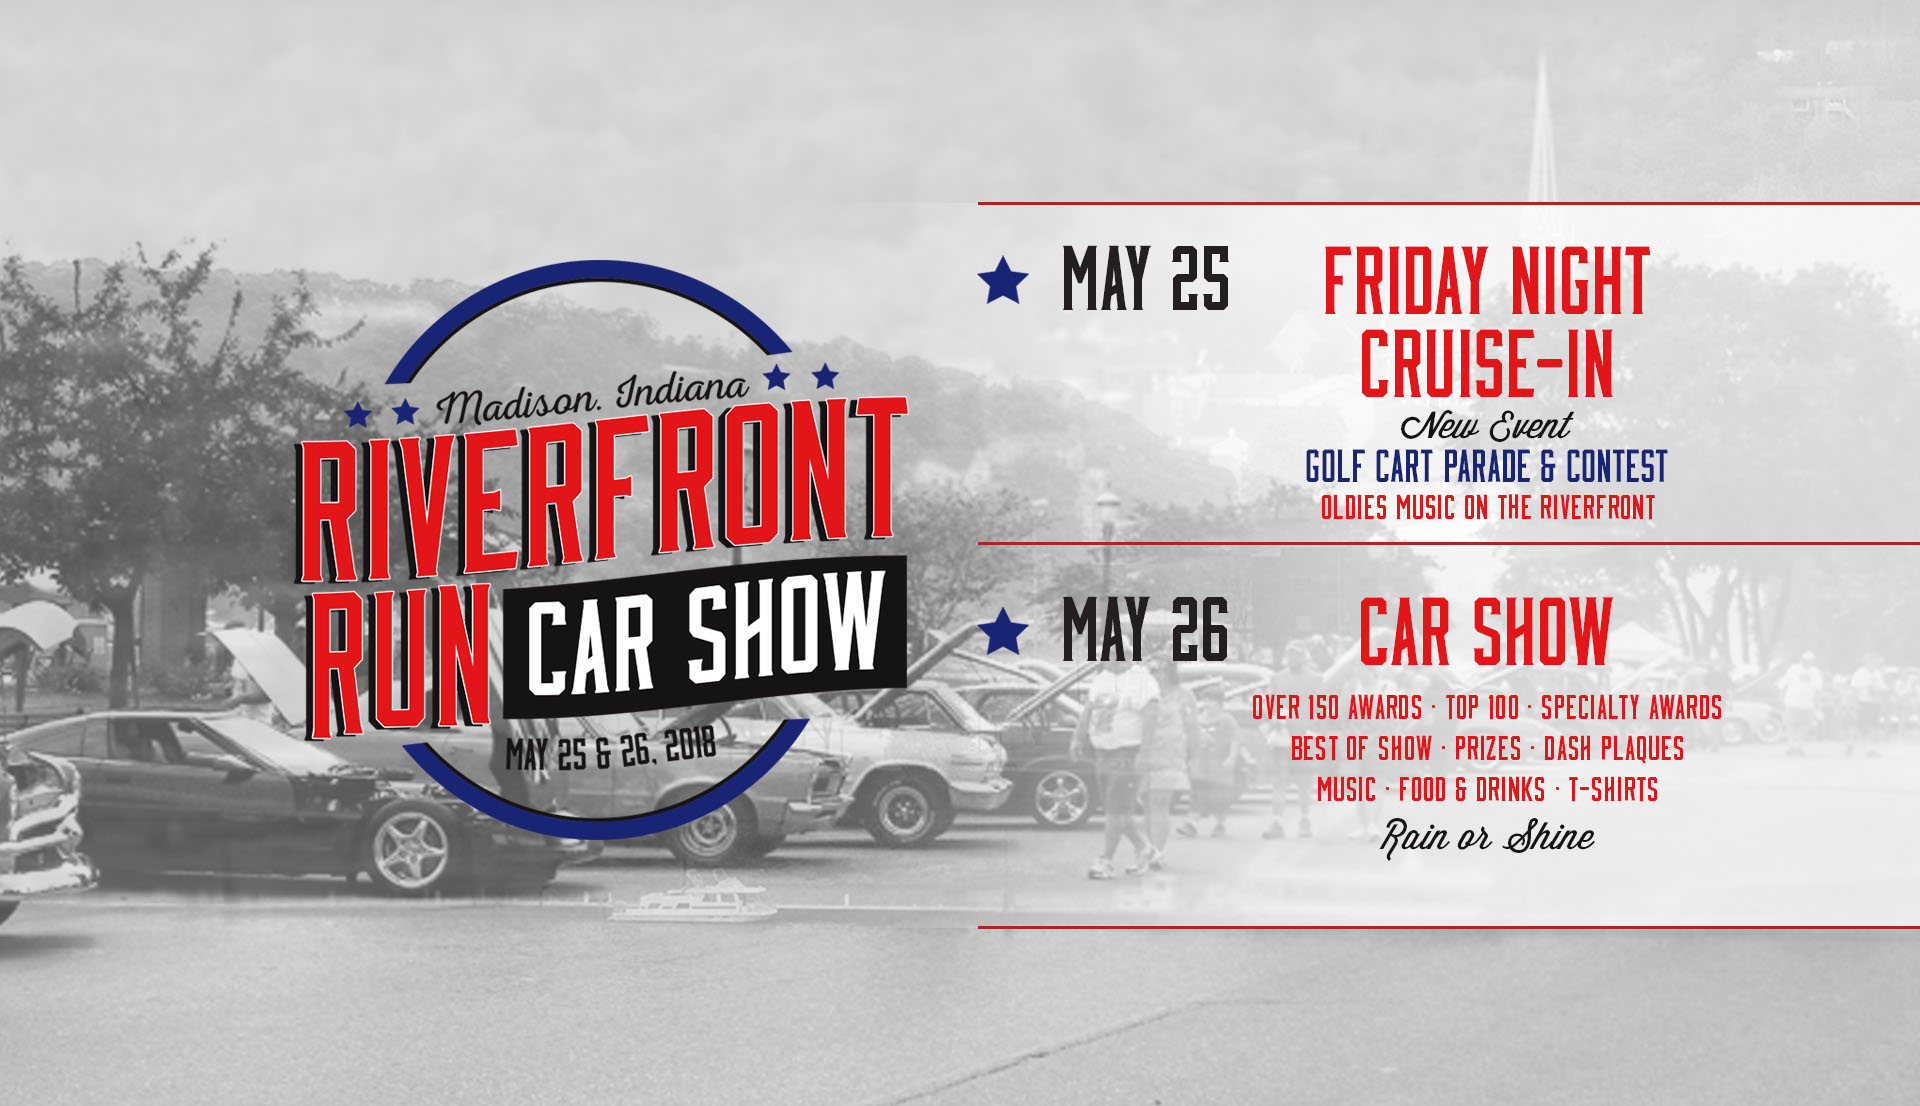 Riverfront Run Car Show